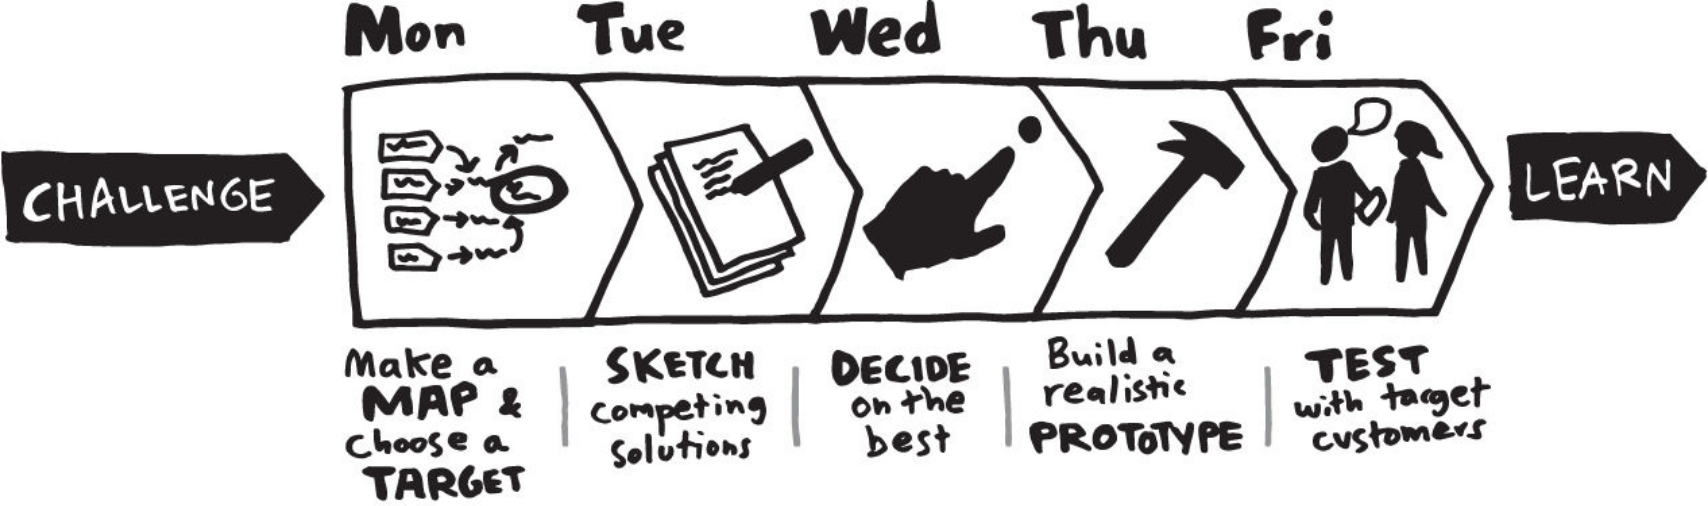 Aus dem Buch von Jake Knapp.  https://sebastian-winkler.de/rezension/sprint-how-to-solve-big-problems-and-test-new-ideas-in-just-five-days/